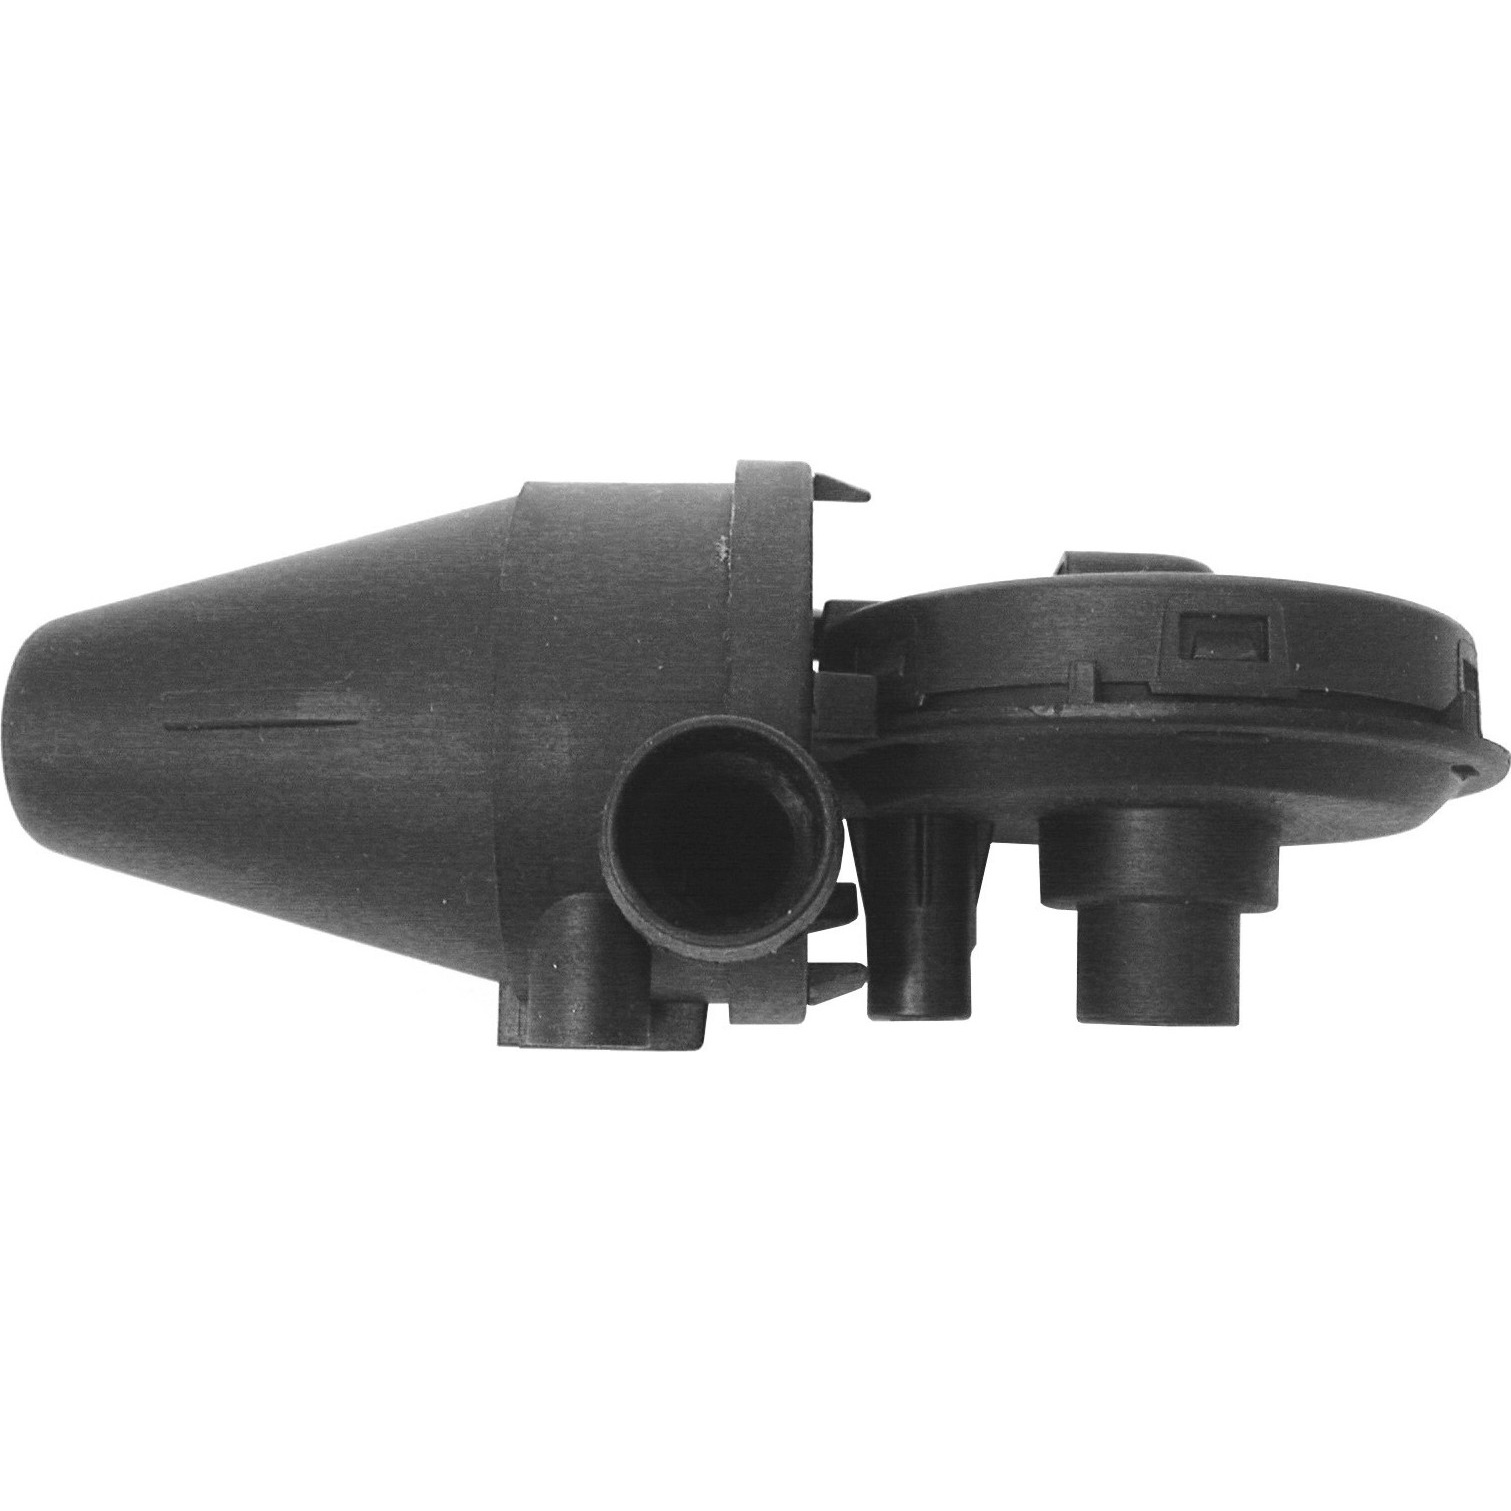 Crankcase Vent Valve / Oil Separator - E36 328/M3, E39 528i M52 97-98, Z3  2 8 97-98, MZ3 S52